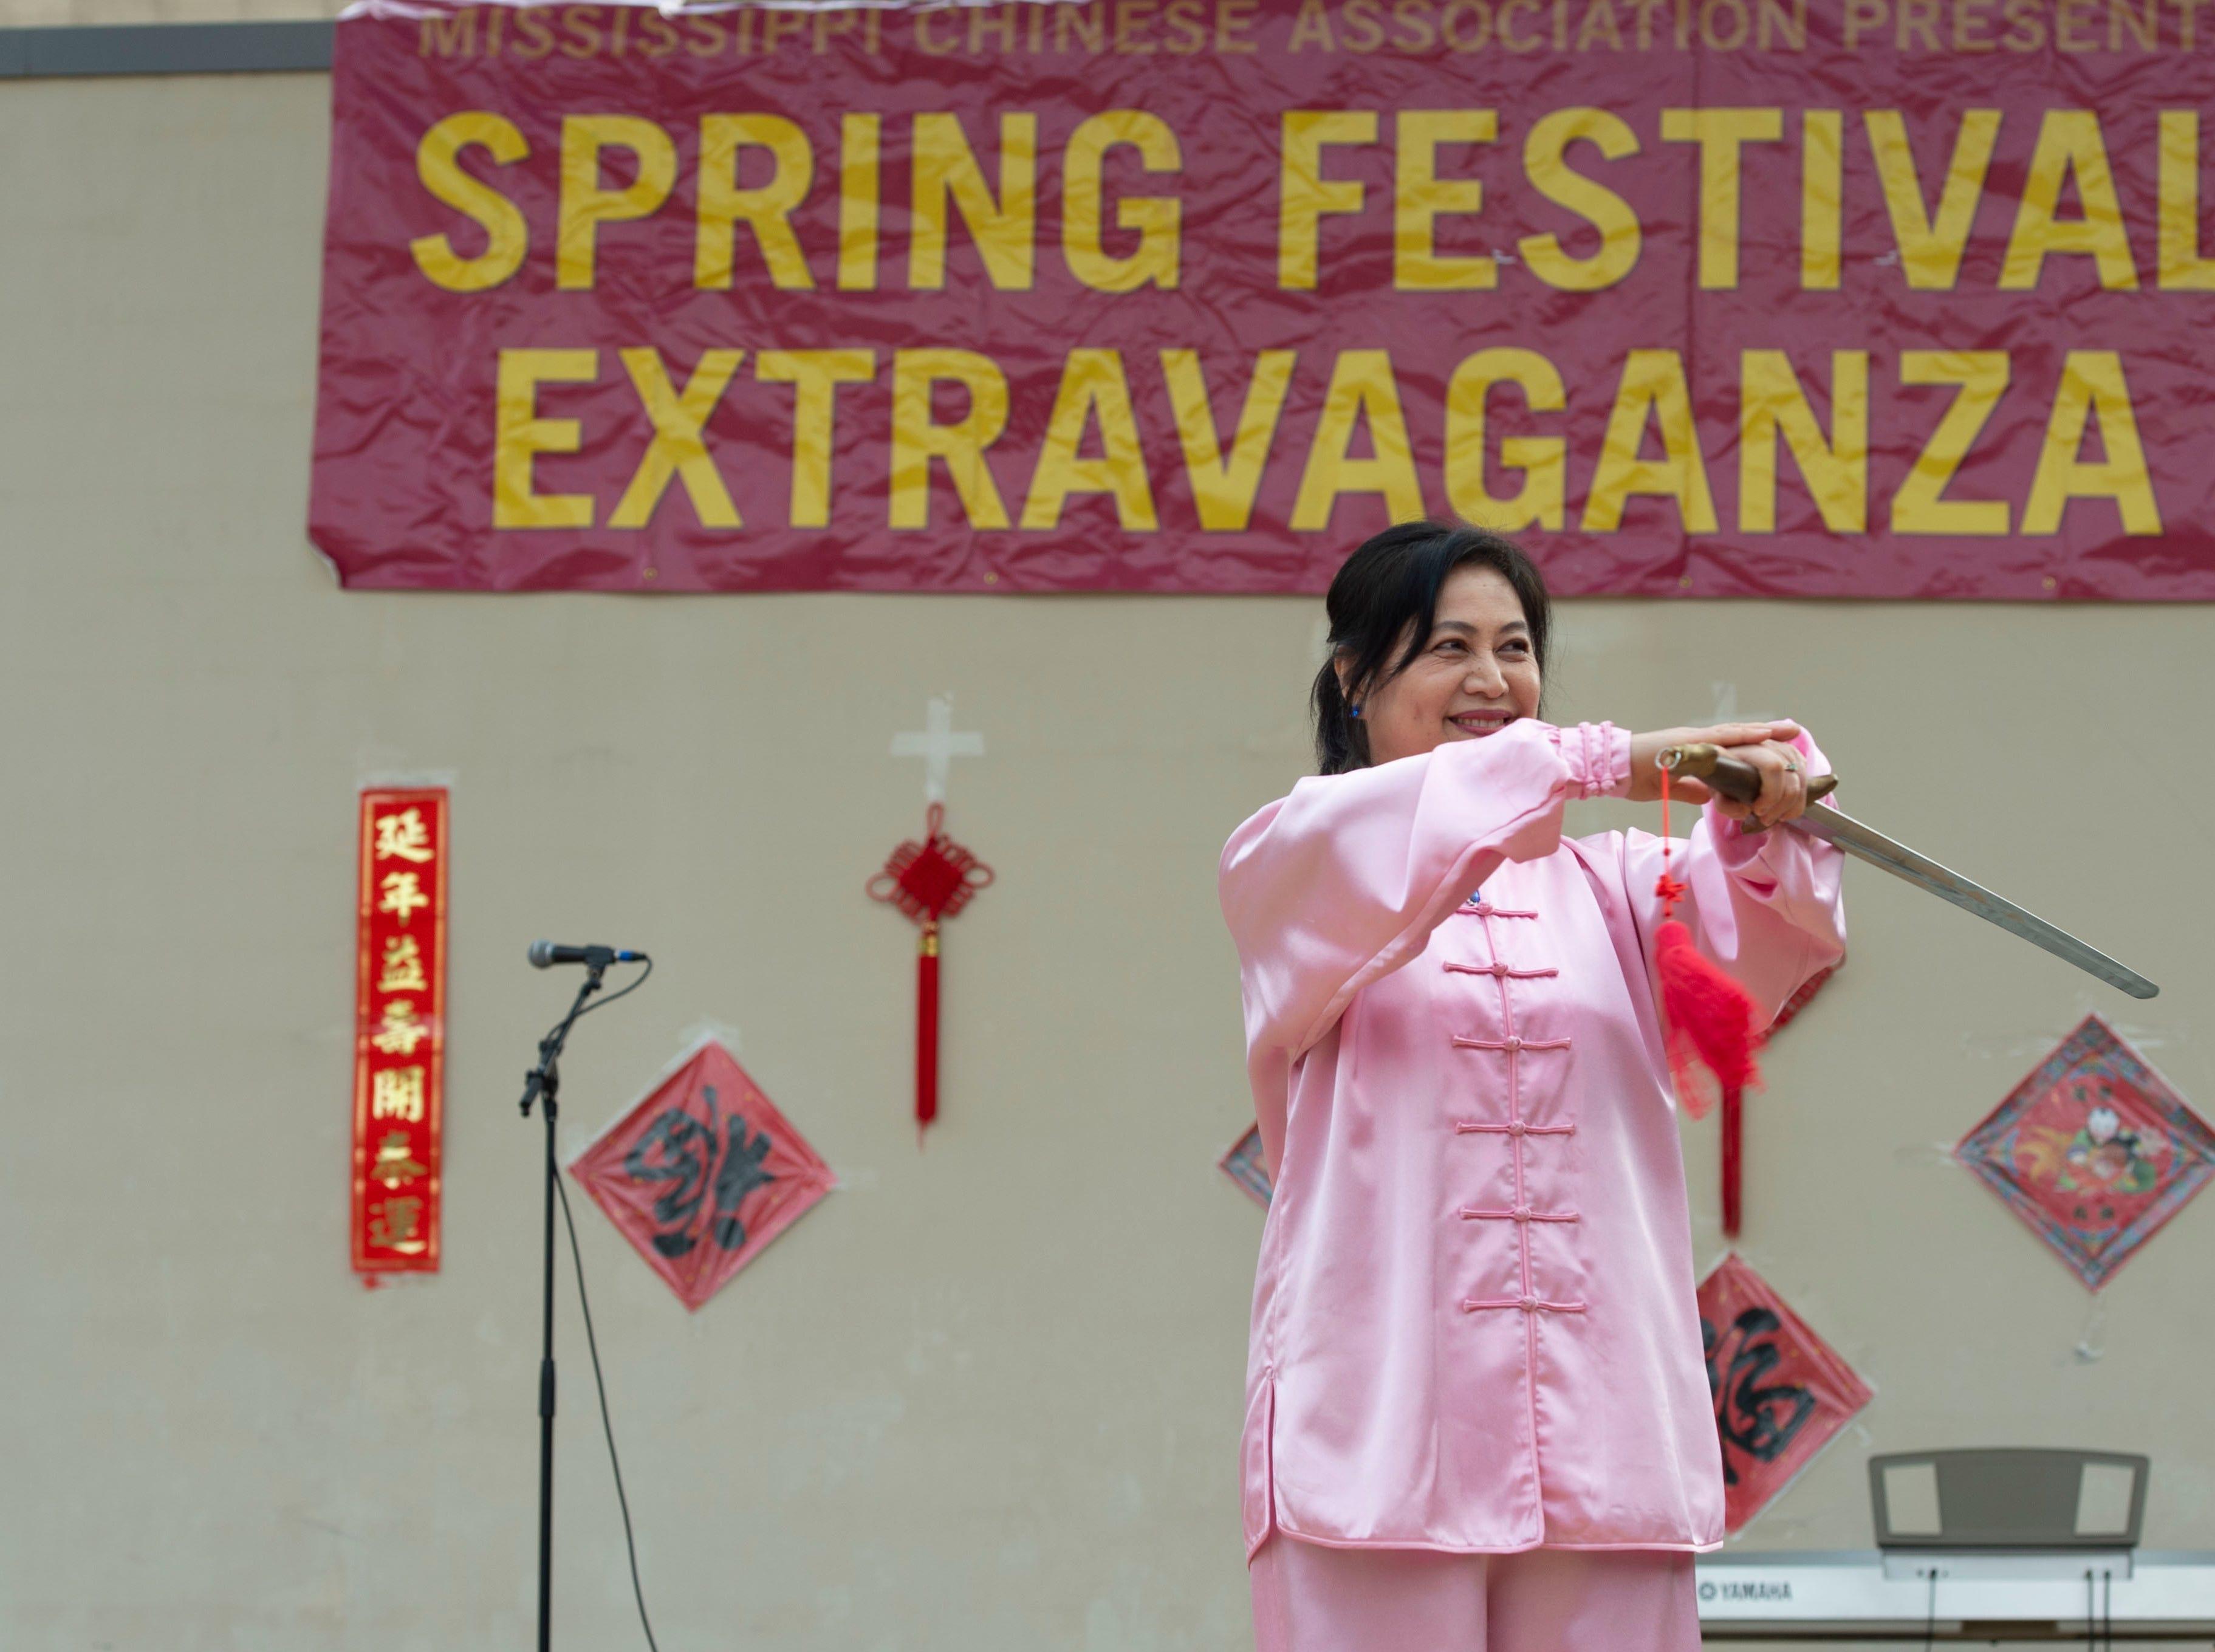 Spring Festival 2019 at Mississippi Museum of Art